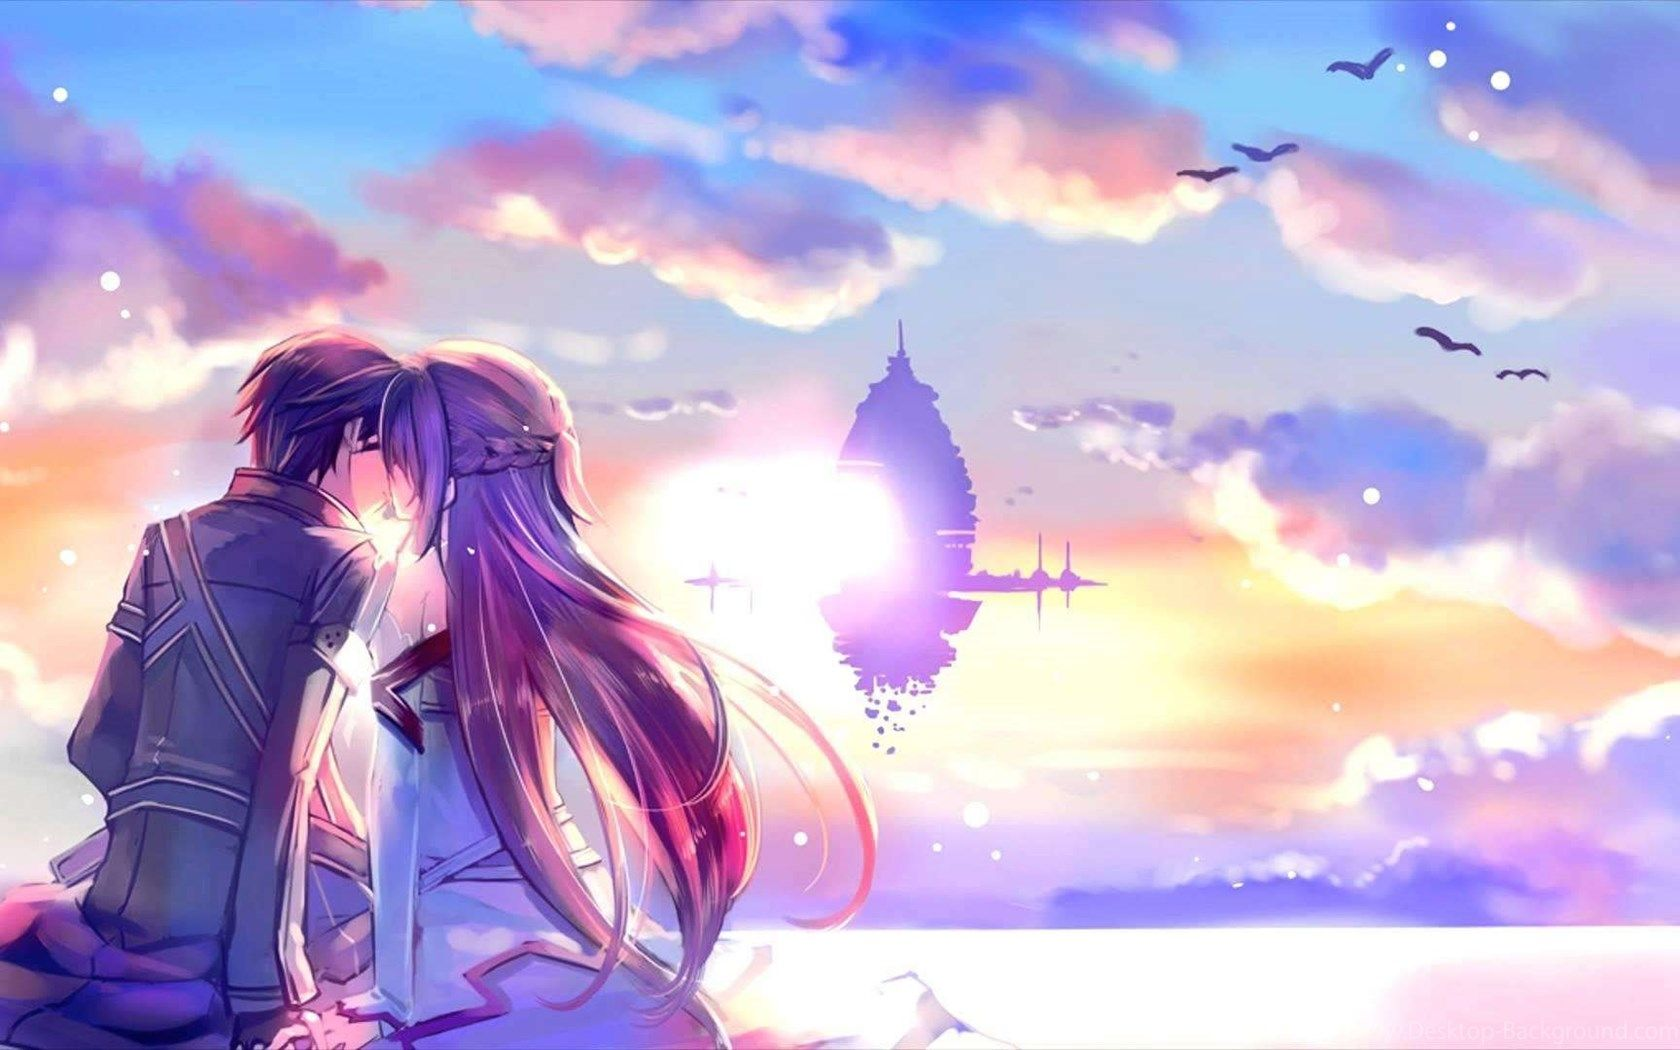 Hd Desktop Backgrounds 1680x1050: Anime Love Desktop Wallpapers